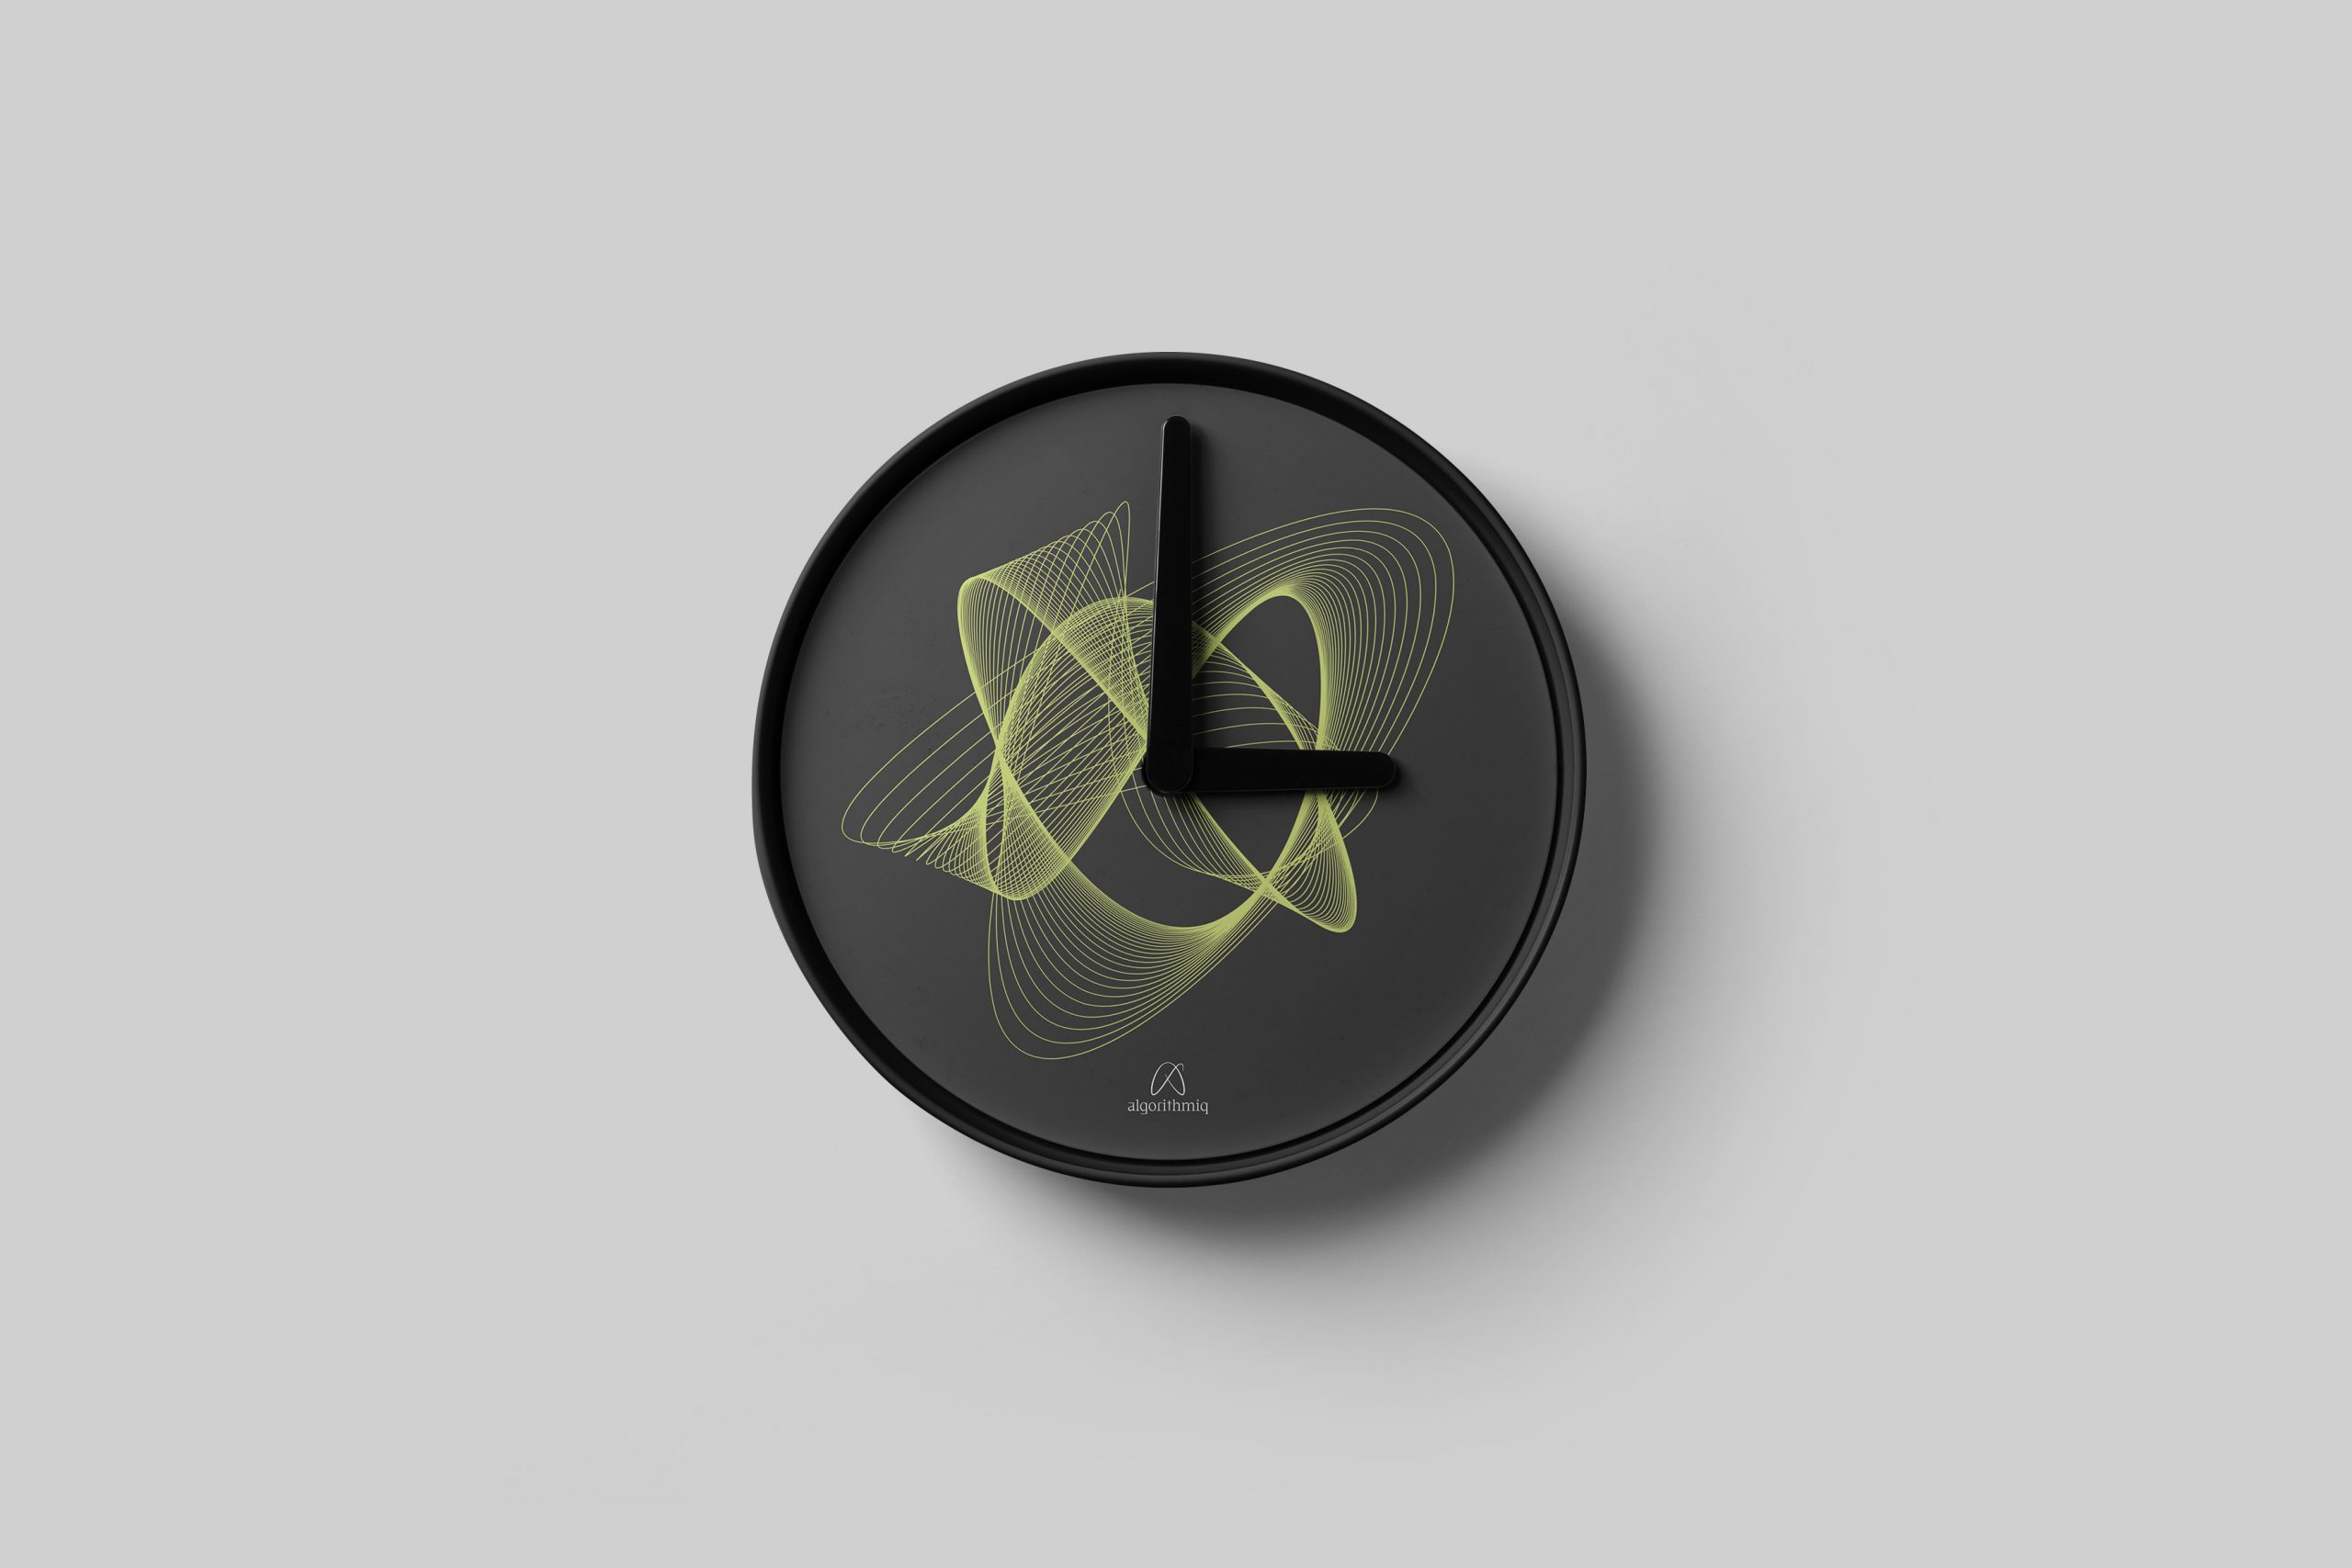 Clock_Algorithmiq-design-quantum-technology-startup